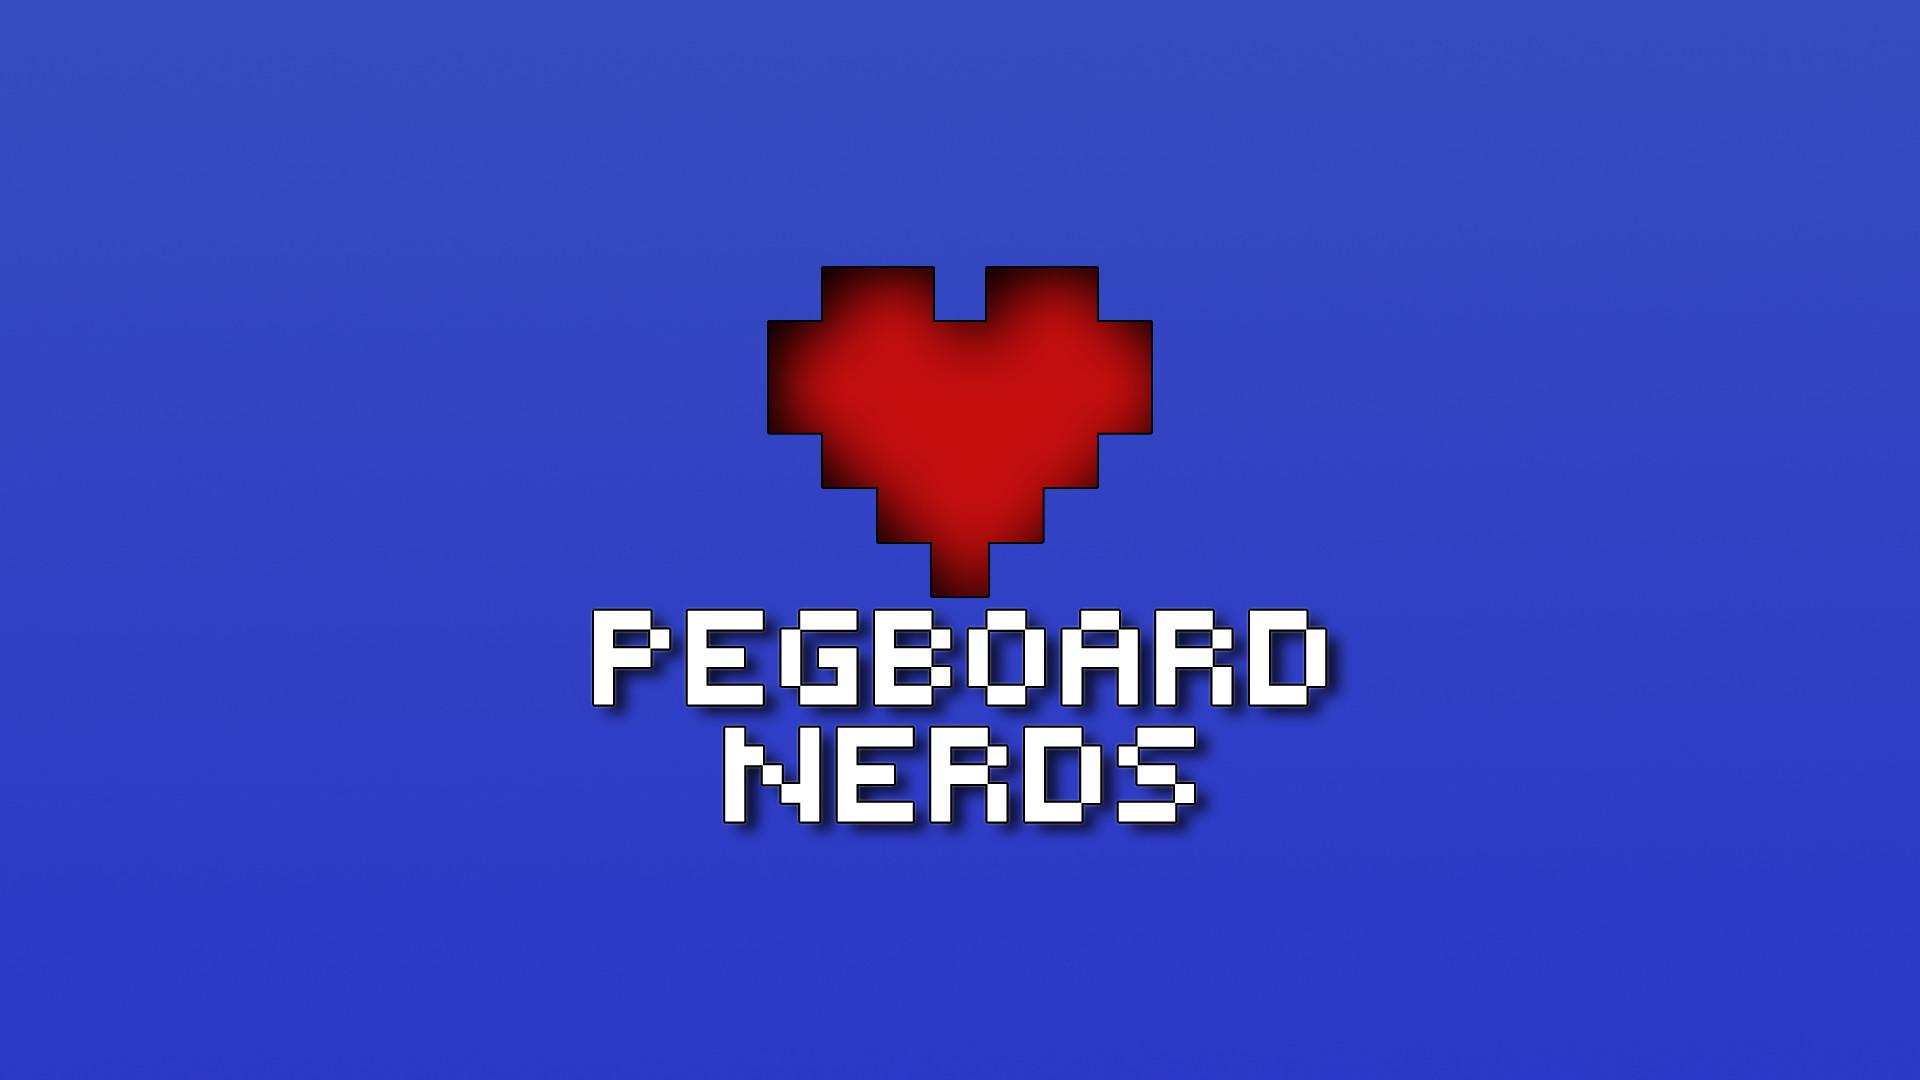 Pegboard Nerds – Simple Wallpaper …